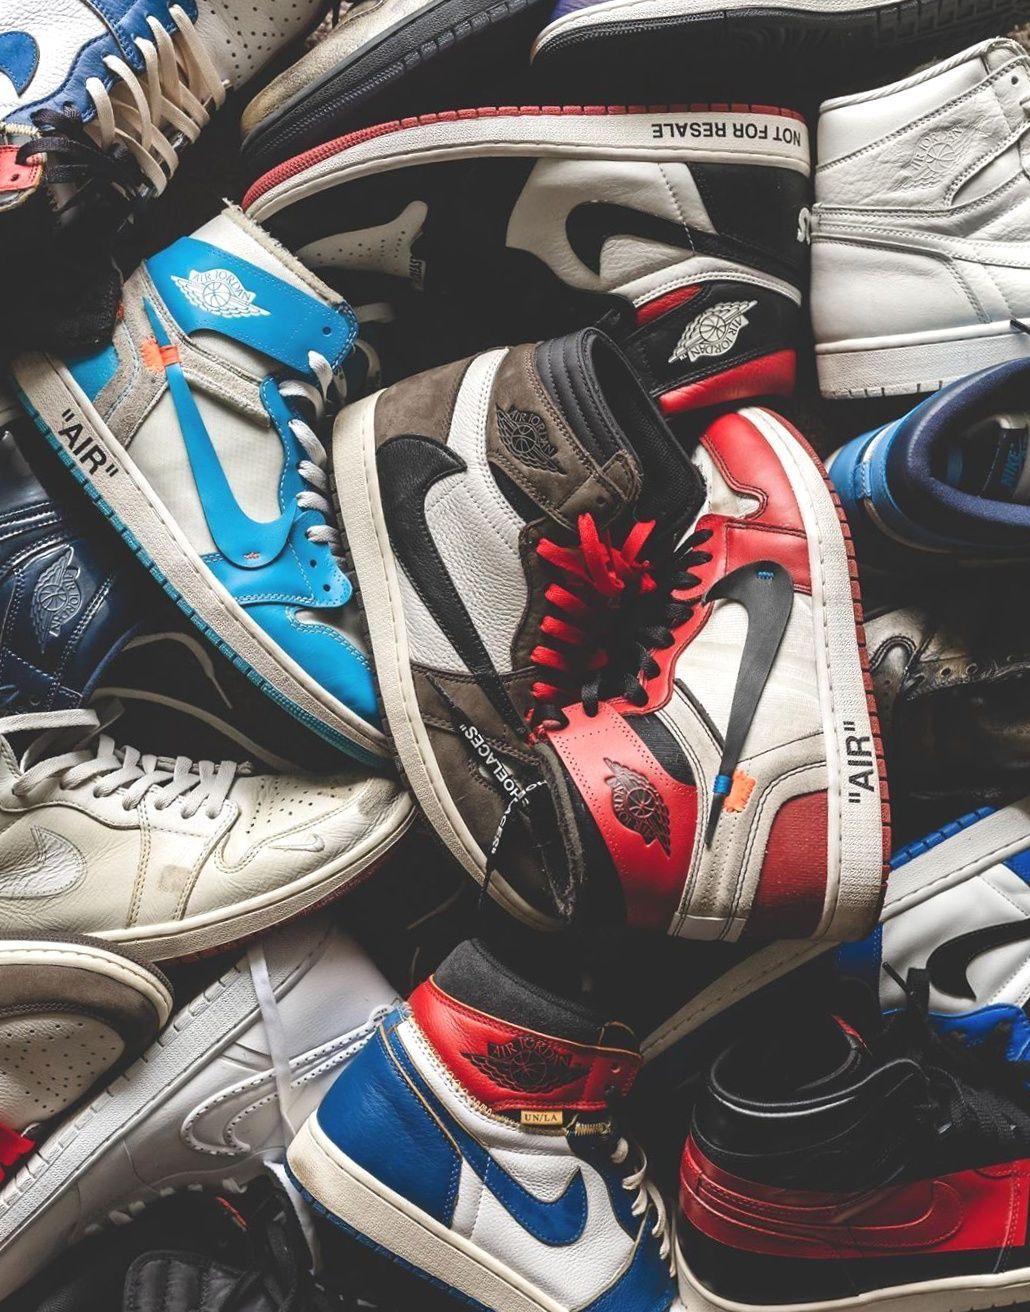 Jordan 1 Retro High Off White 2020 Christmas Outifts Trendsoutfit Casual Shoes In 2020 Jordan 1 Retro High Sneakers Fashion Jordan Fashions